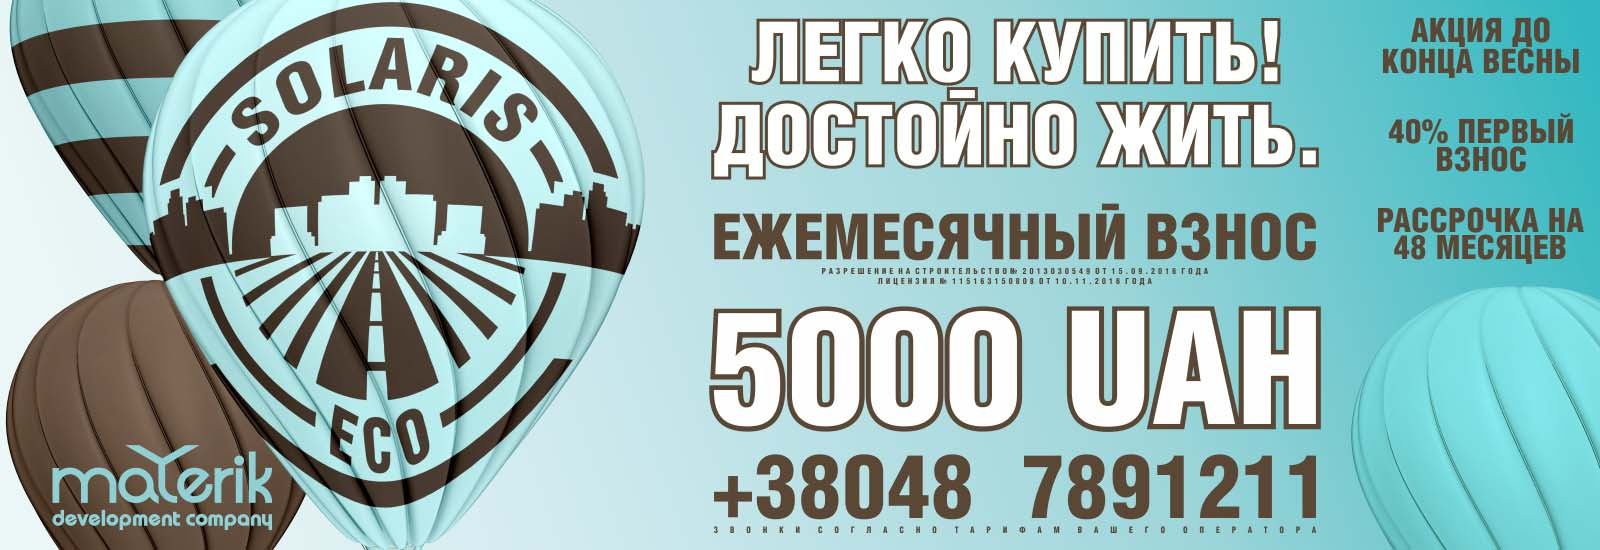 1600_550_shary_150kb.jpg